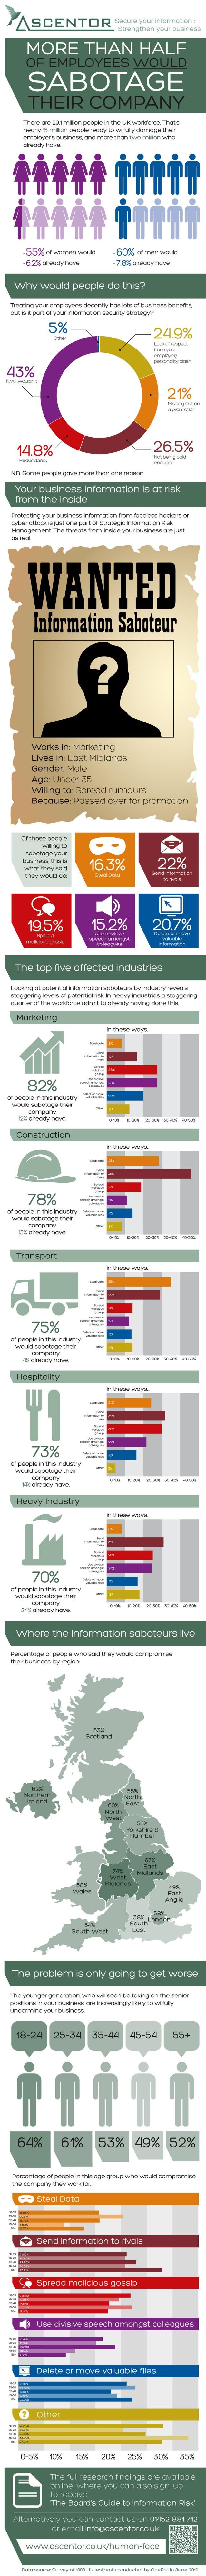 Infographic on Information Saboteurs